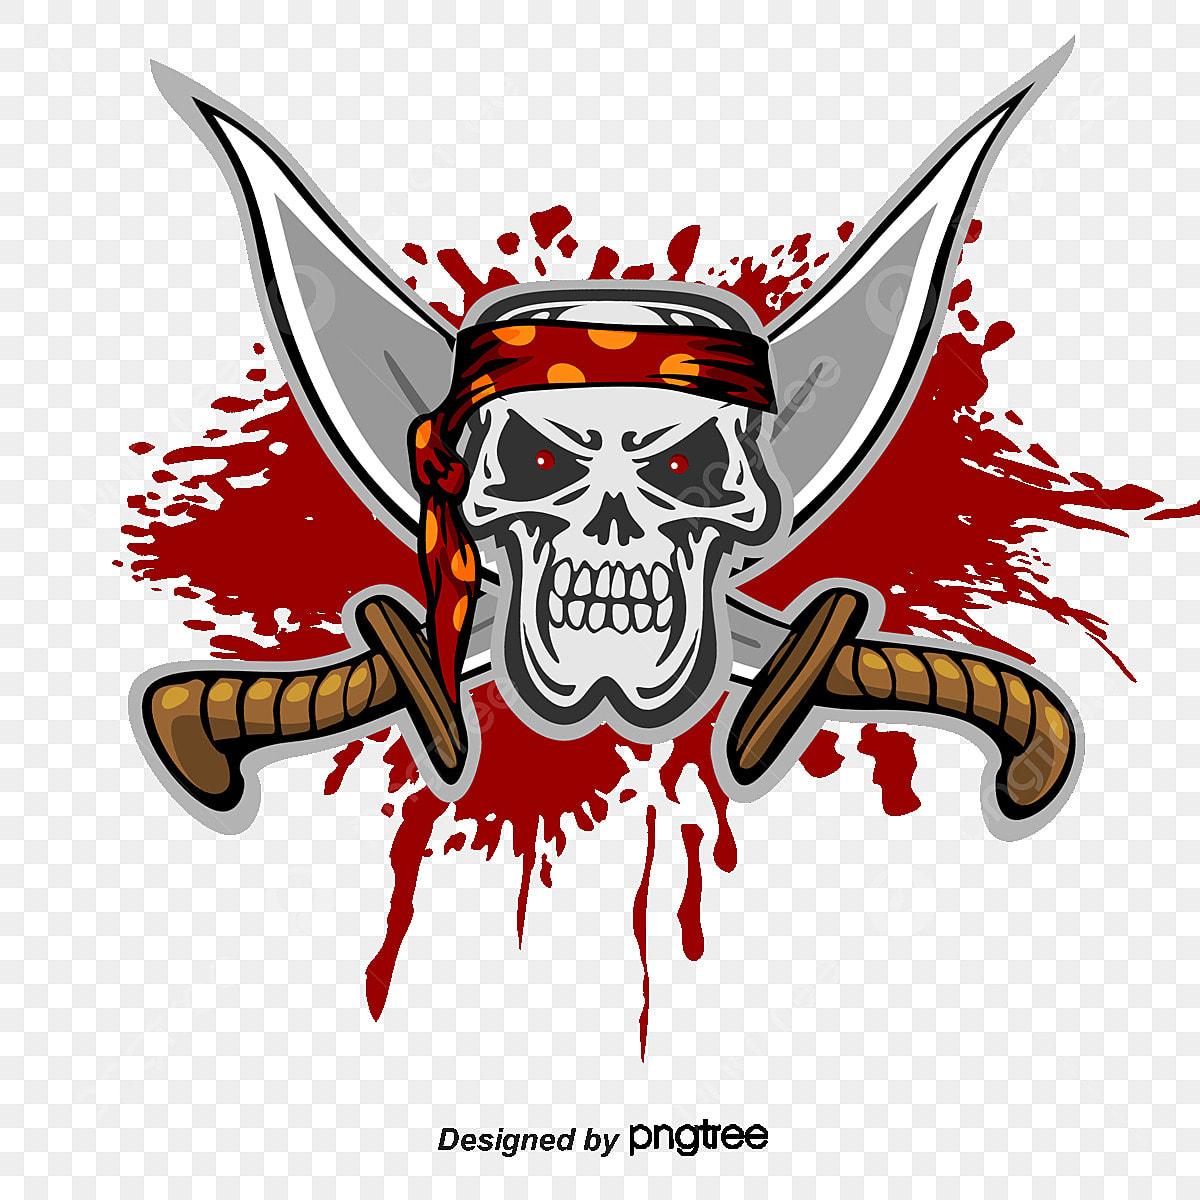 cr u00e2ne pirate pirate cr u00e2ne flamme fichier png et psd pour le t u00e9l u00e9chargement libre